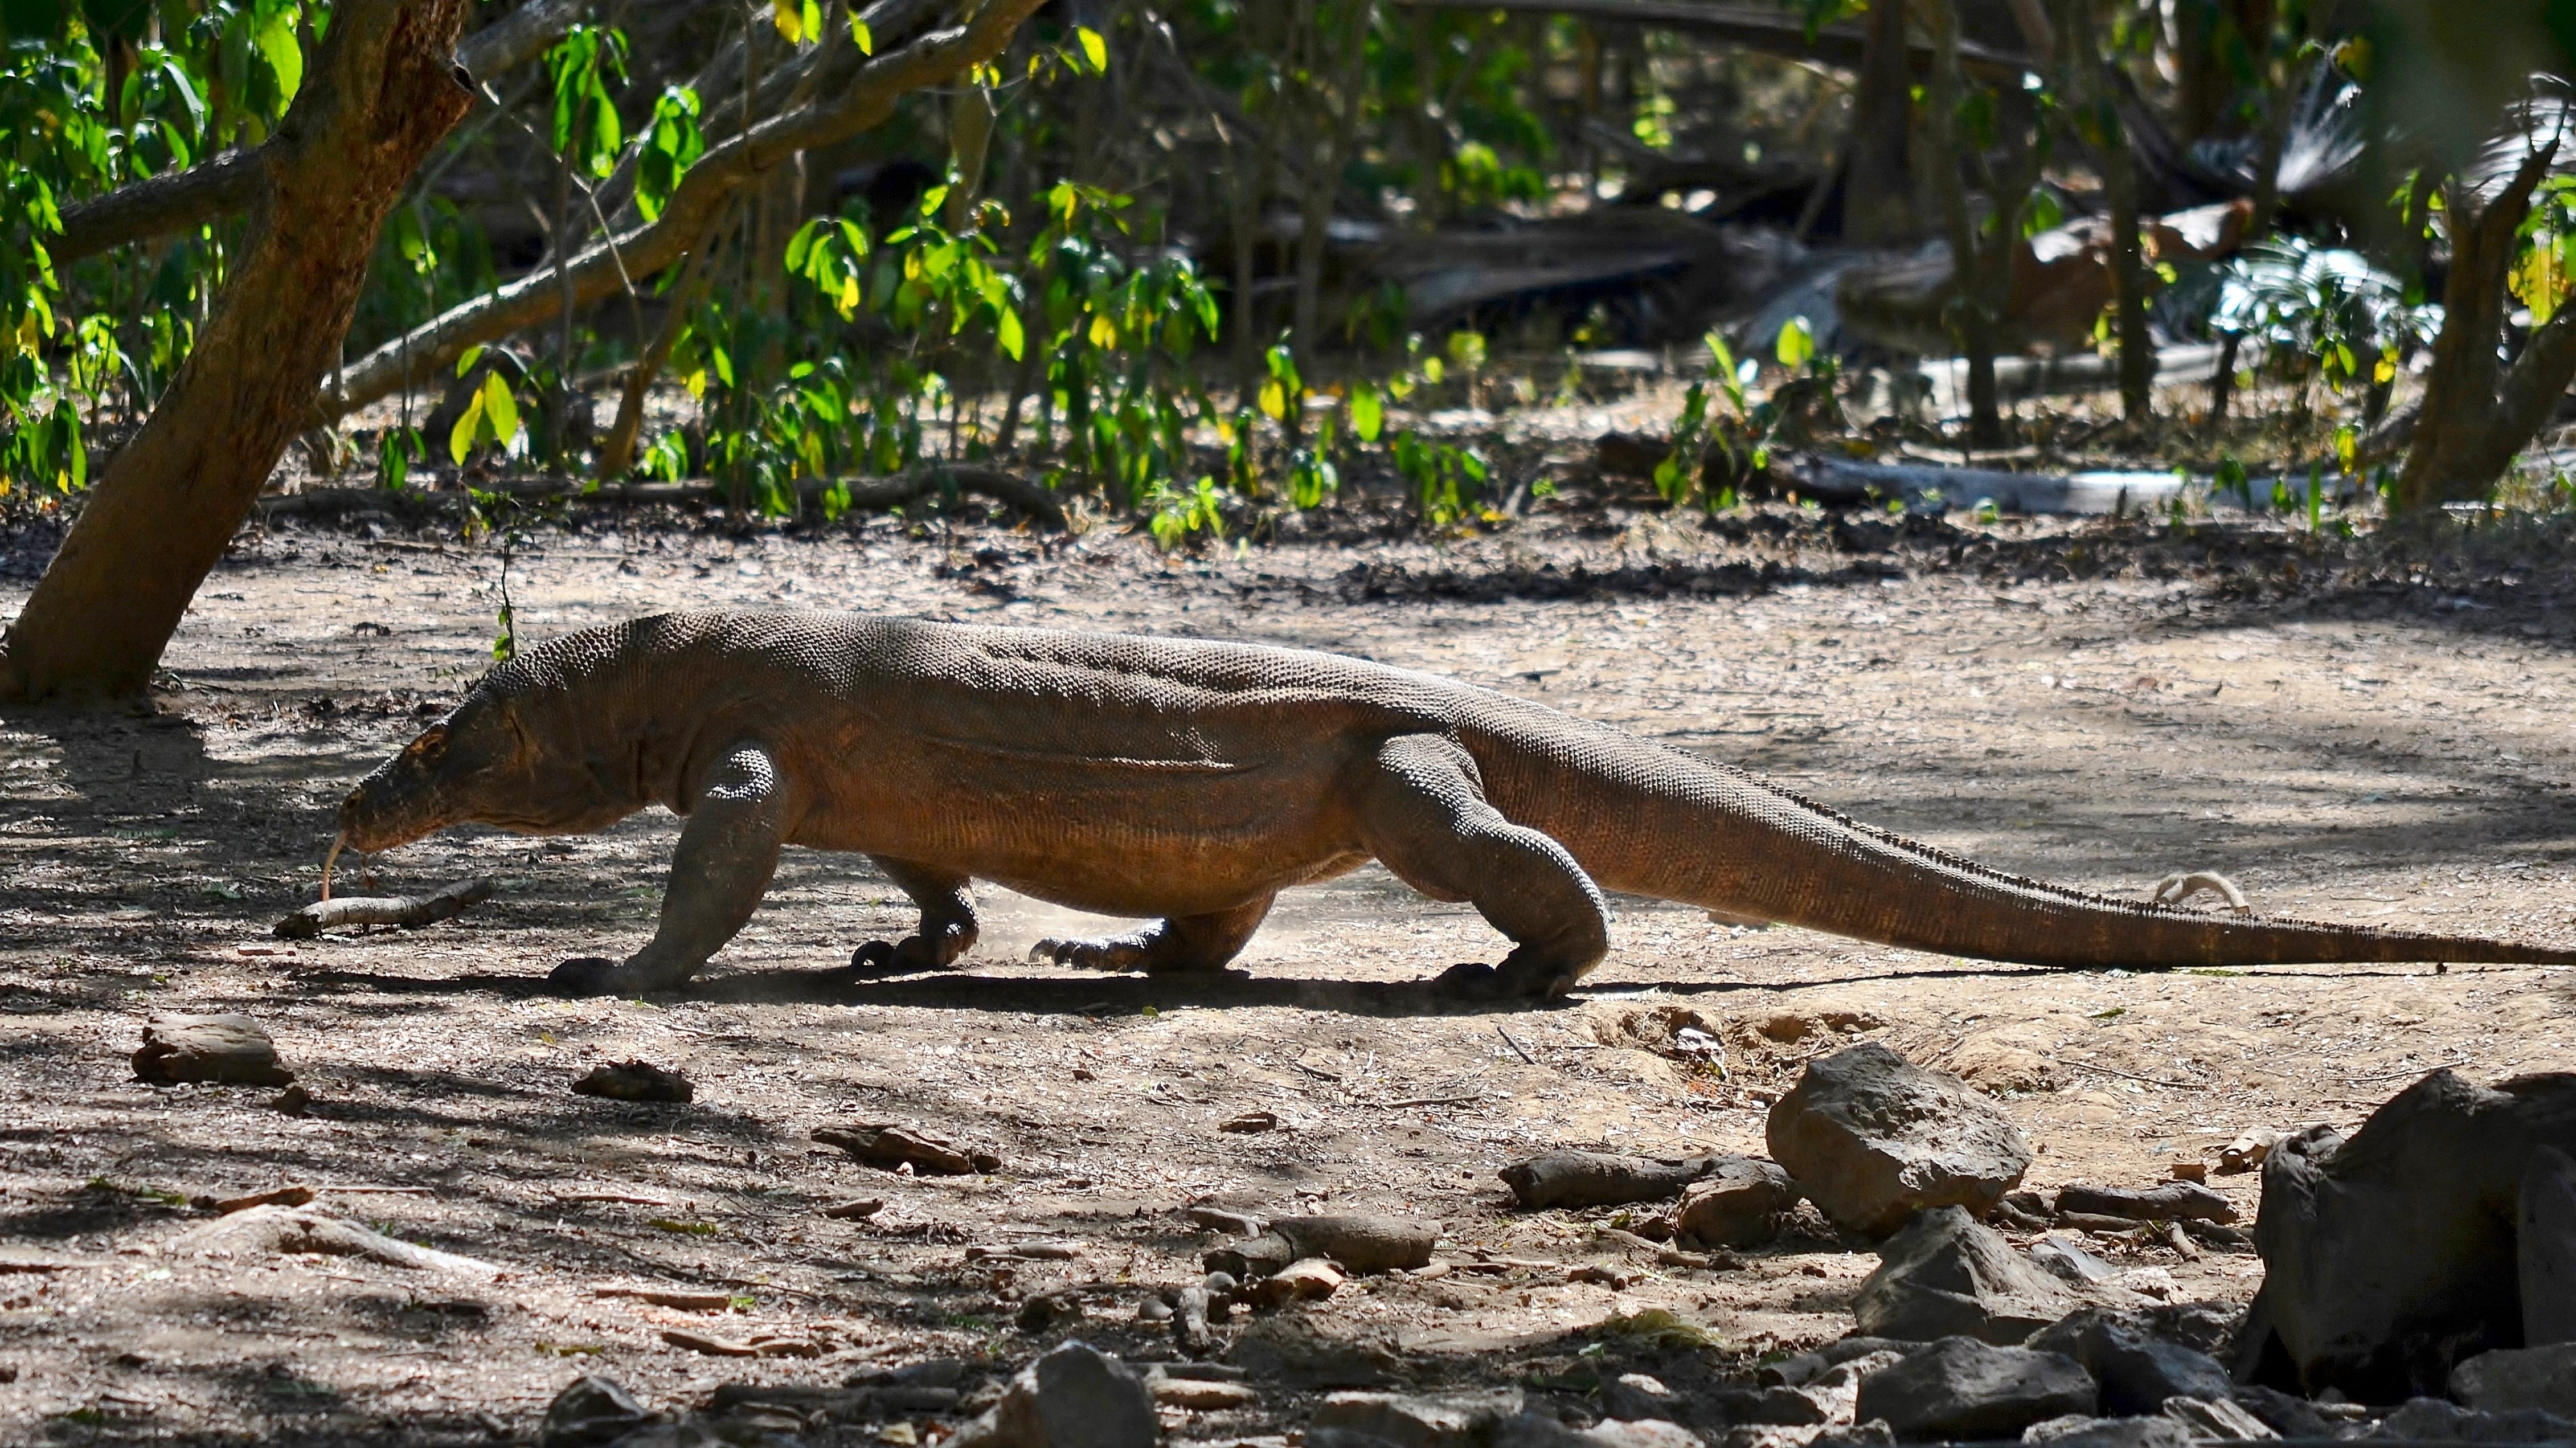 File:Komodo Dragon, Komodo, 2016 (07).jpg - Wikimedia Commons